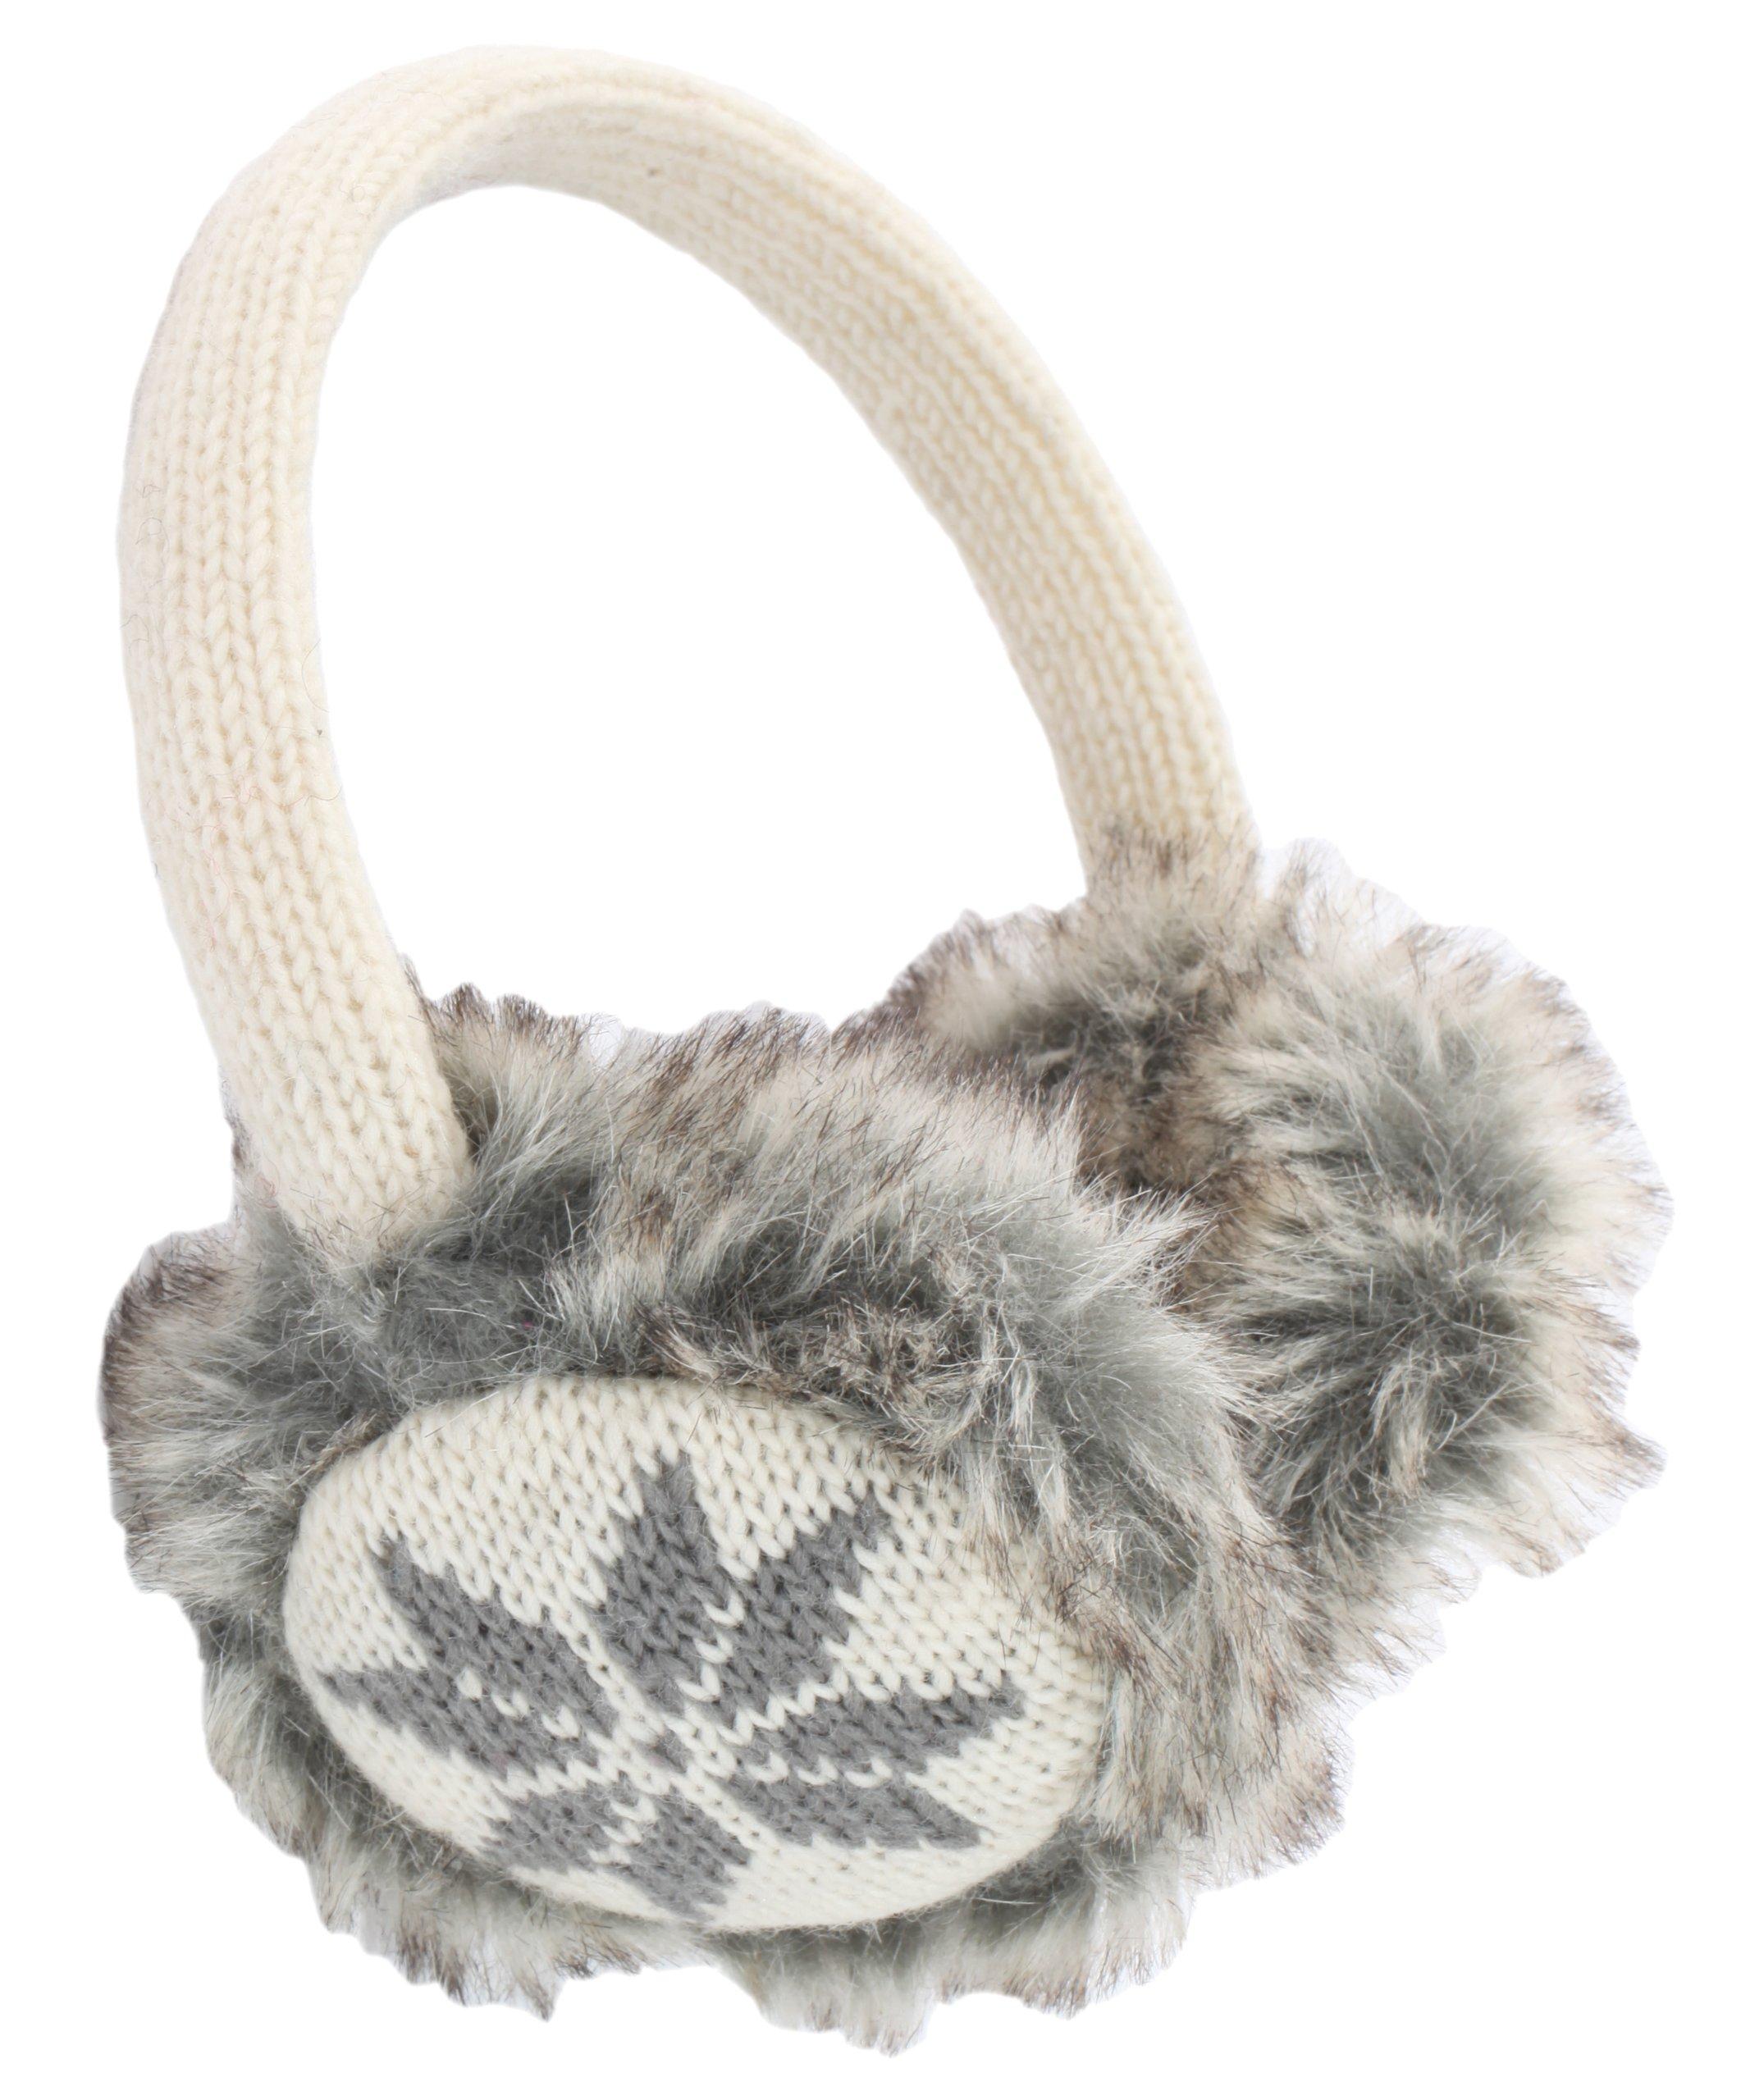 Nirvanna Designs EA02 Snowflake Earmuffs with Faux Fur, White